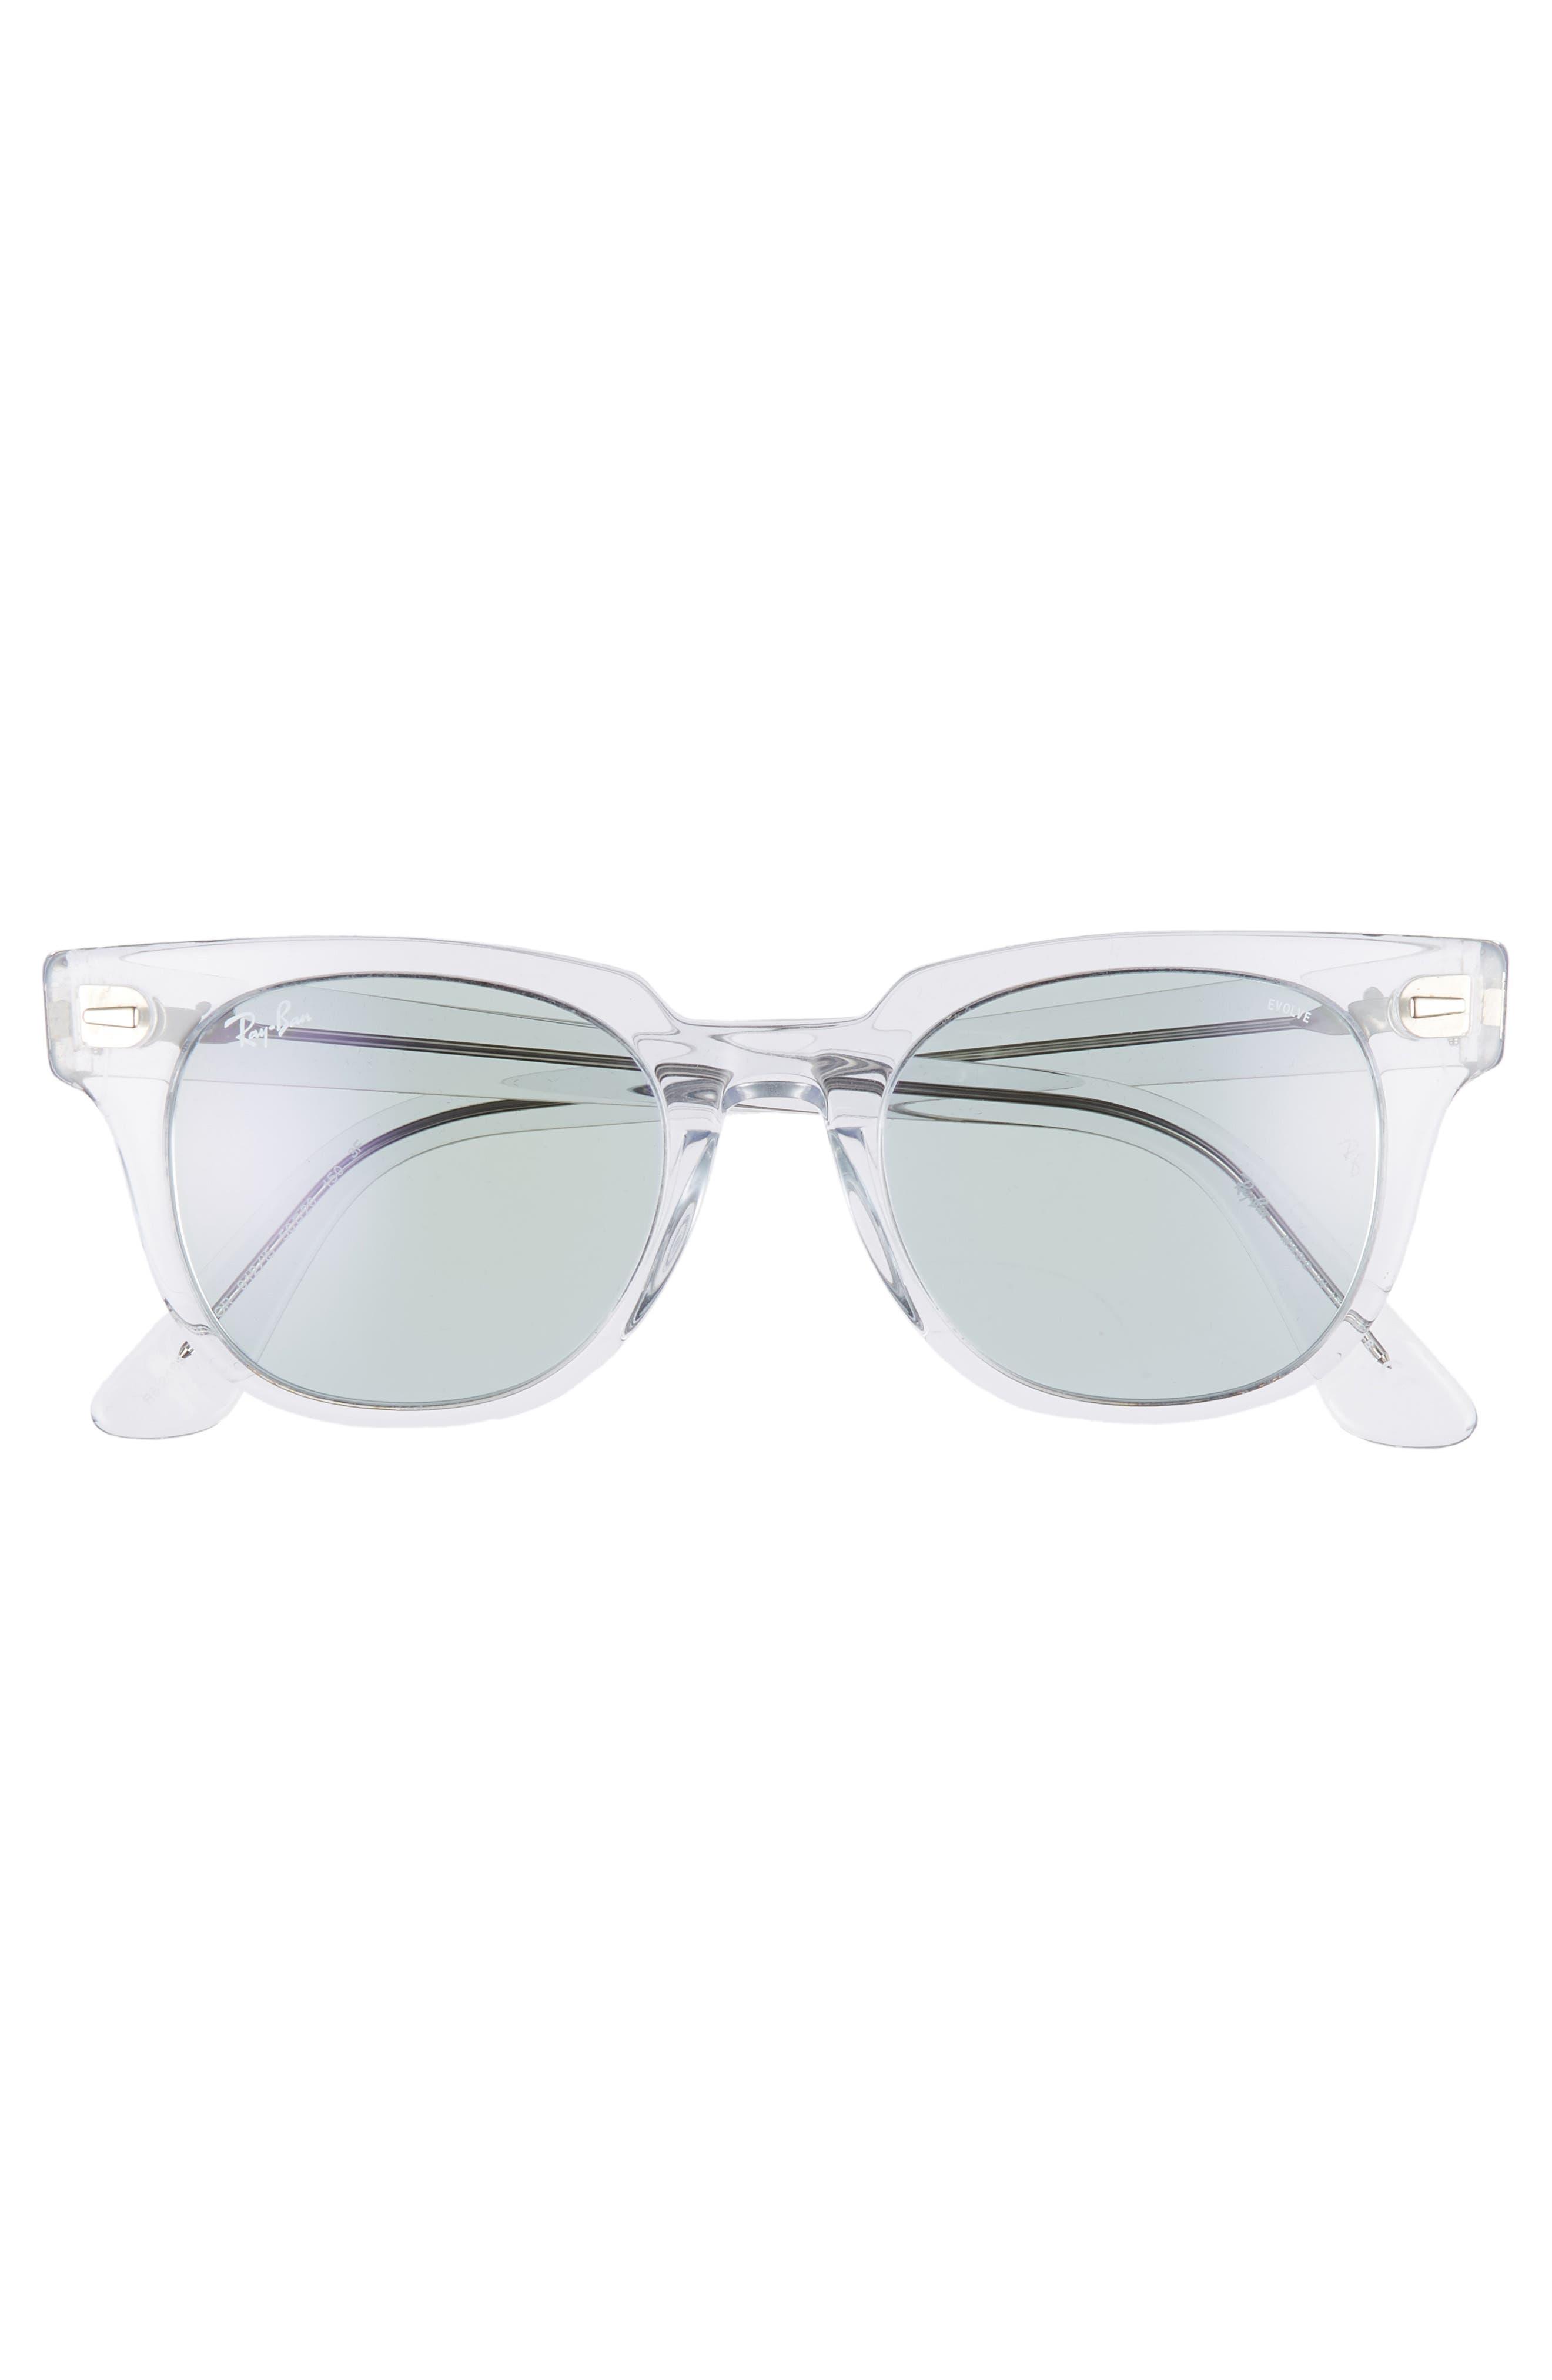 Meteor 50mm Polarized Wayfarer Sunglasses,                             Alternate thumbnail 3, color,                             CRYSTAL/ BLUE SOLID